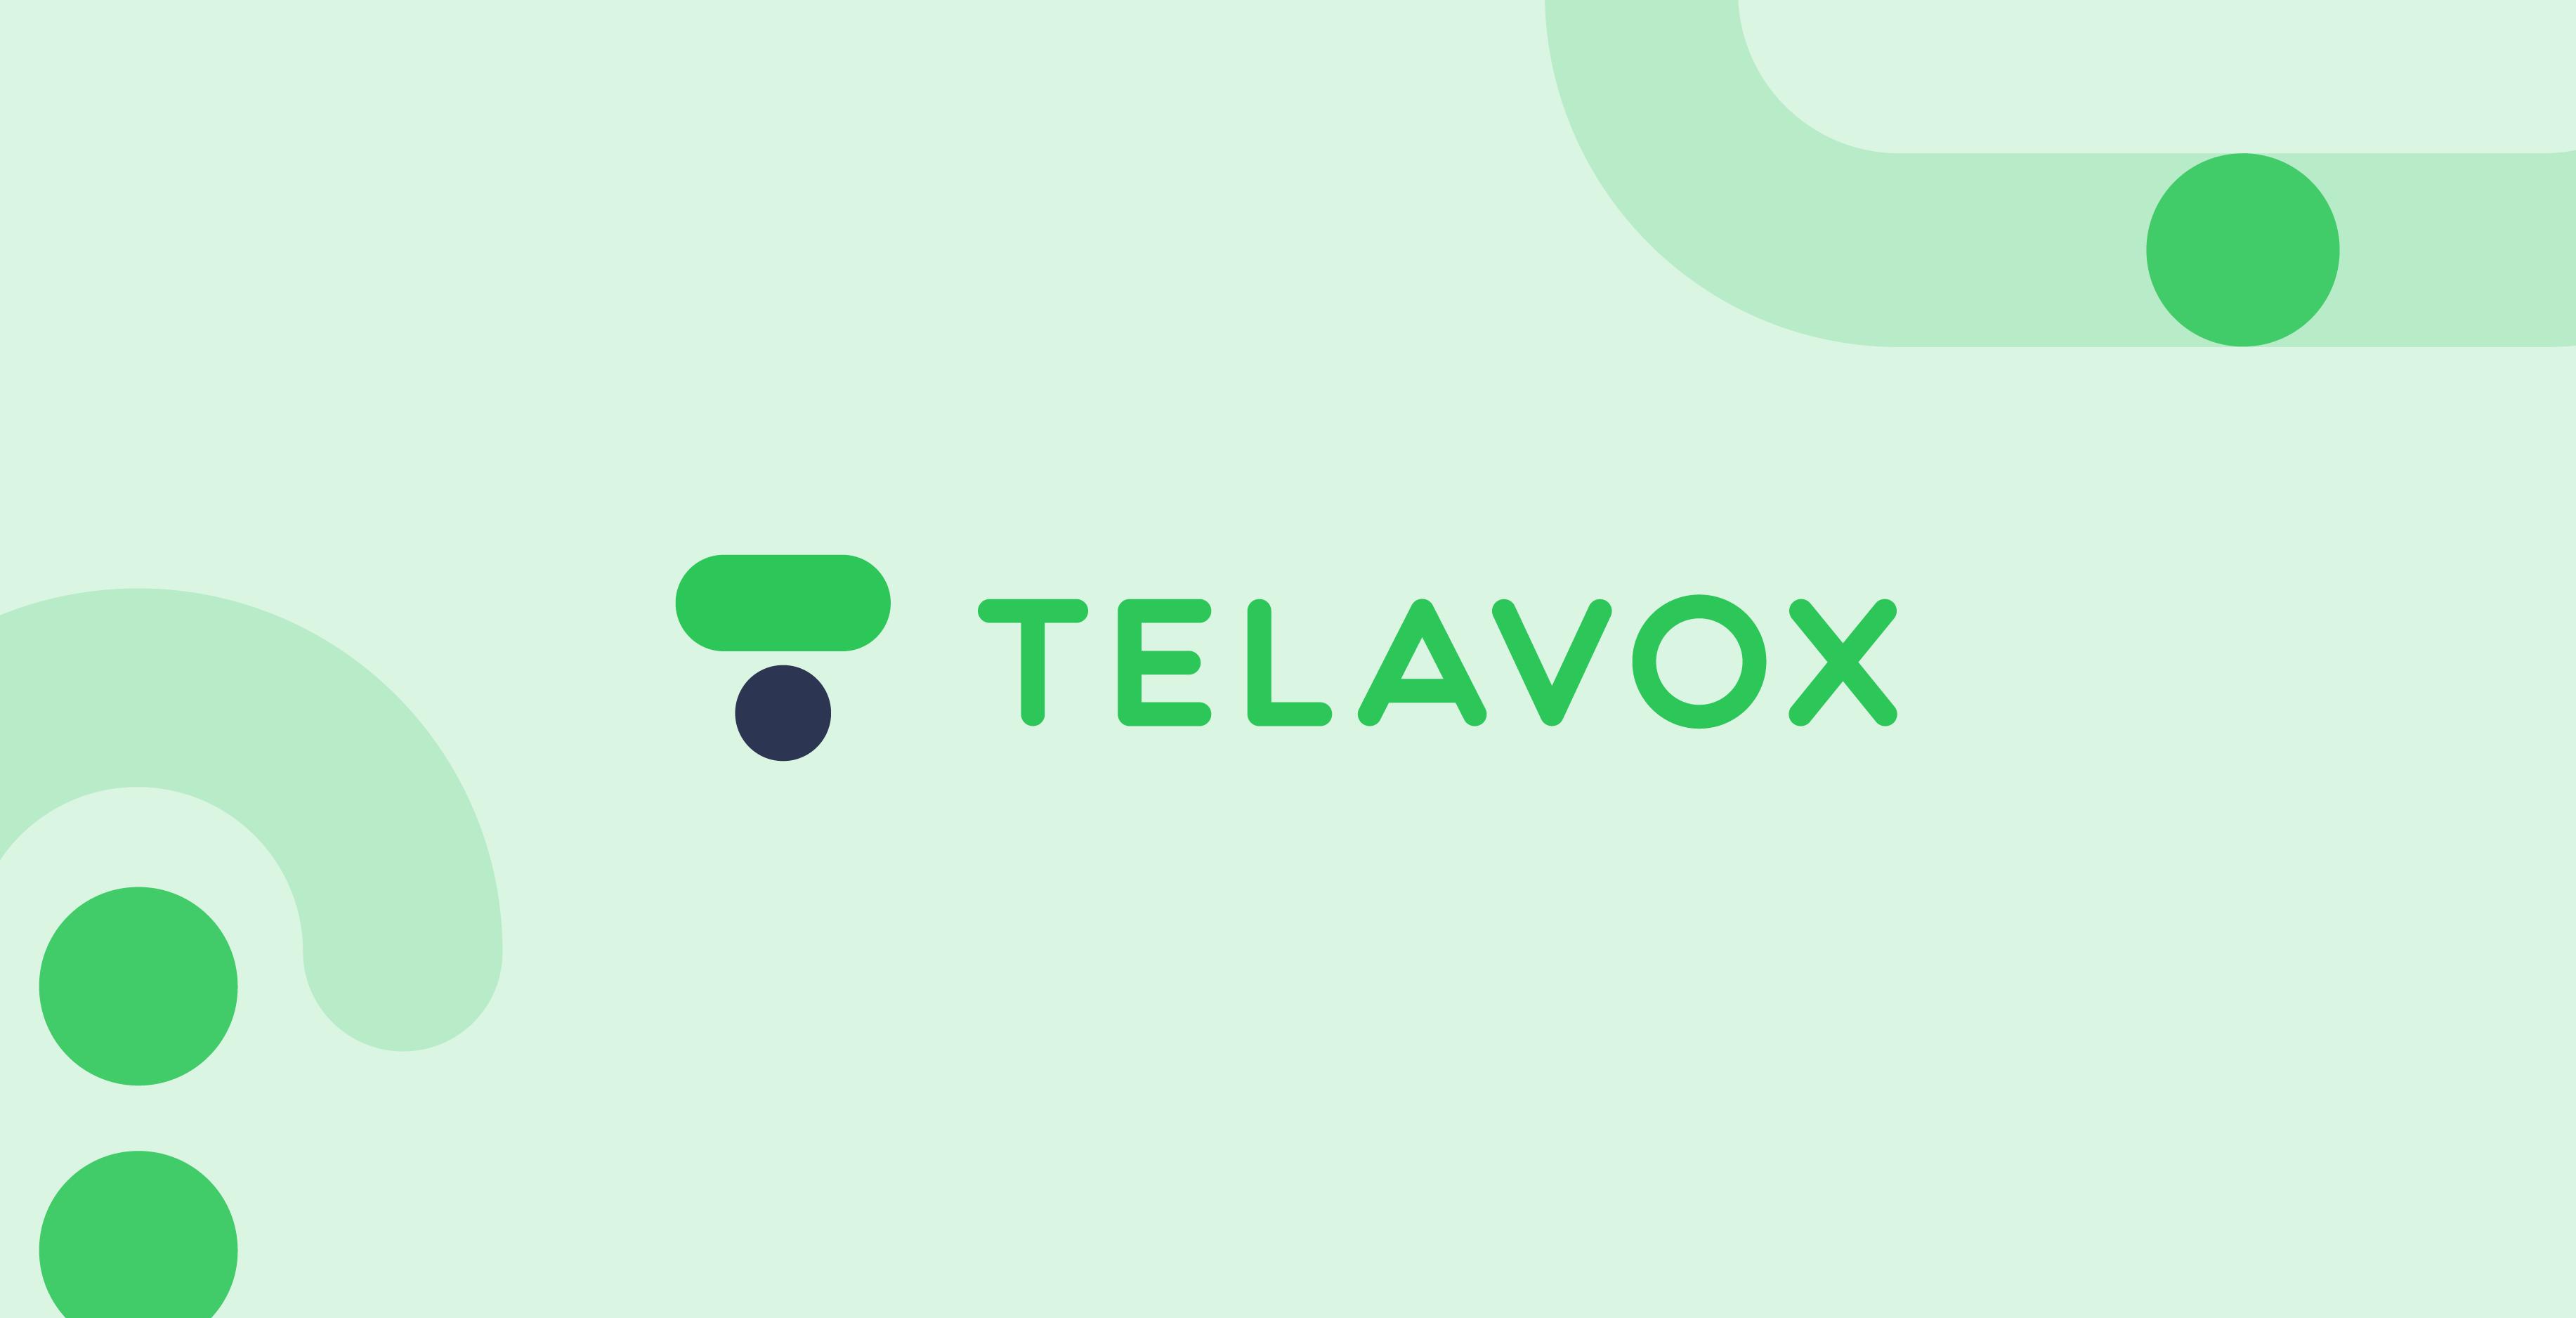 Telavox new logo